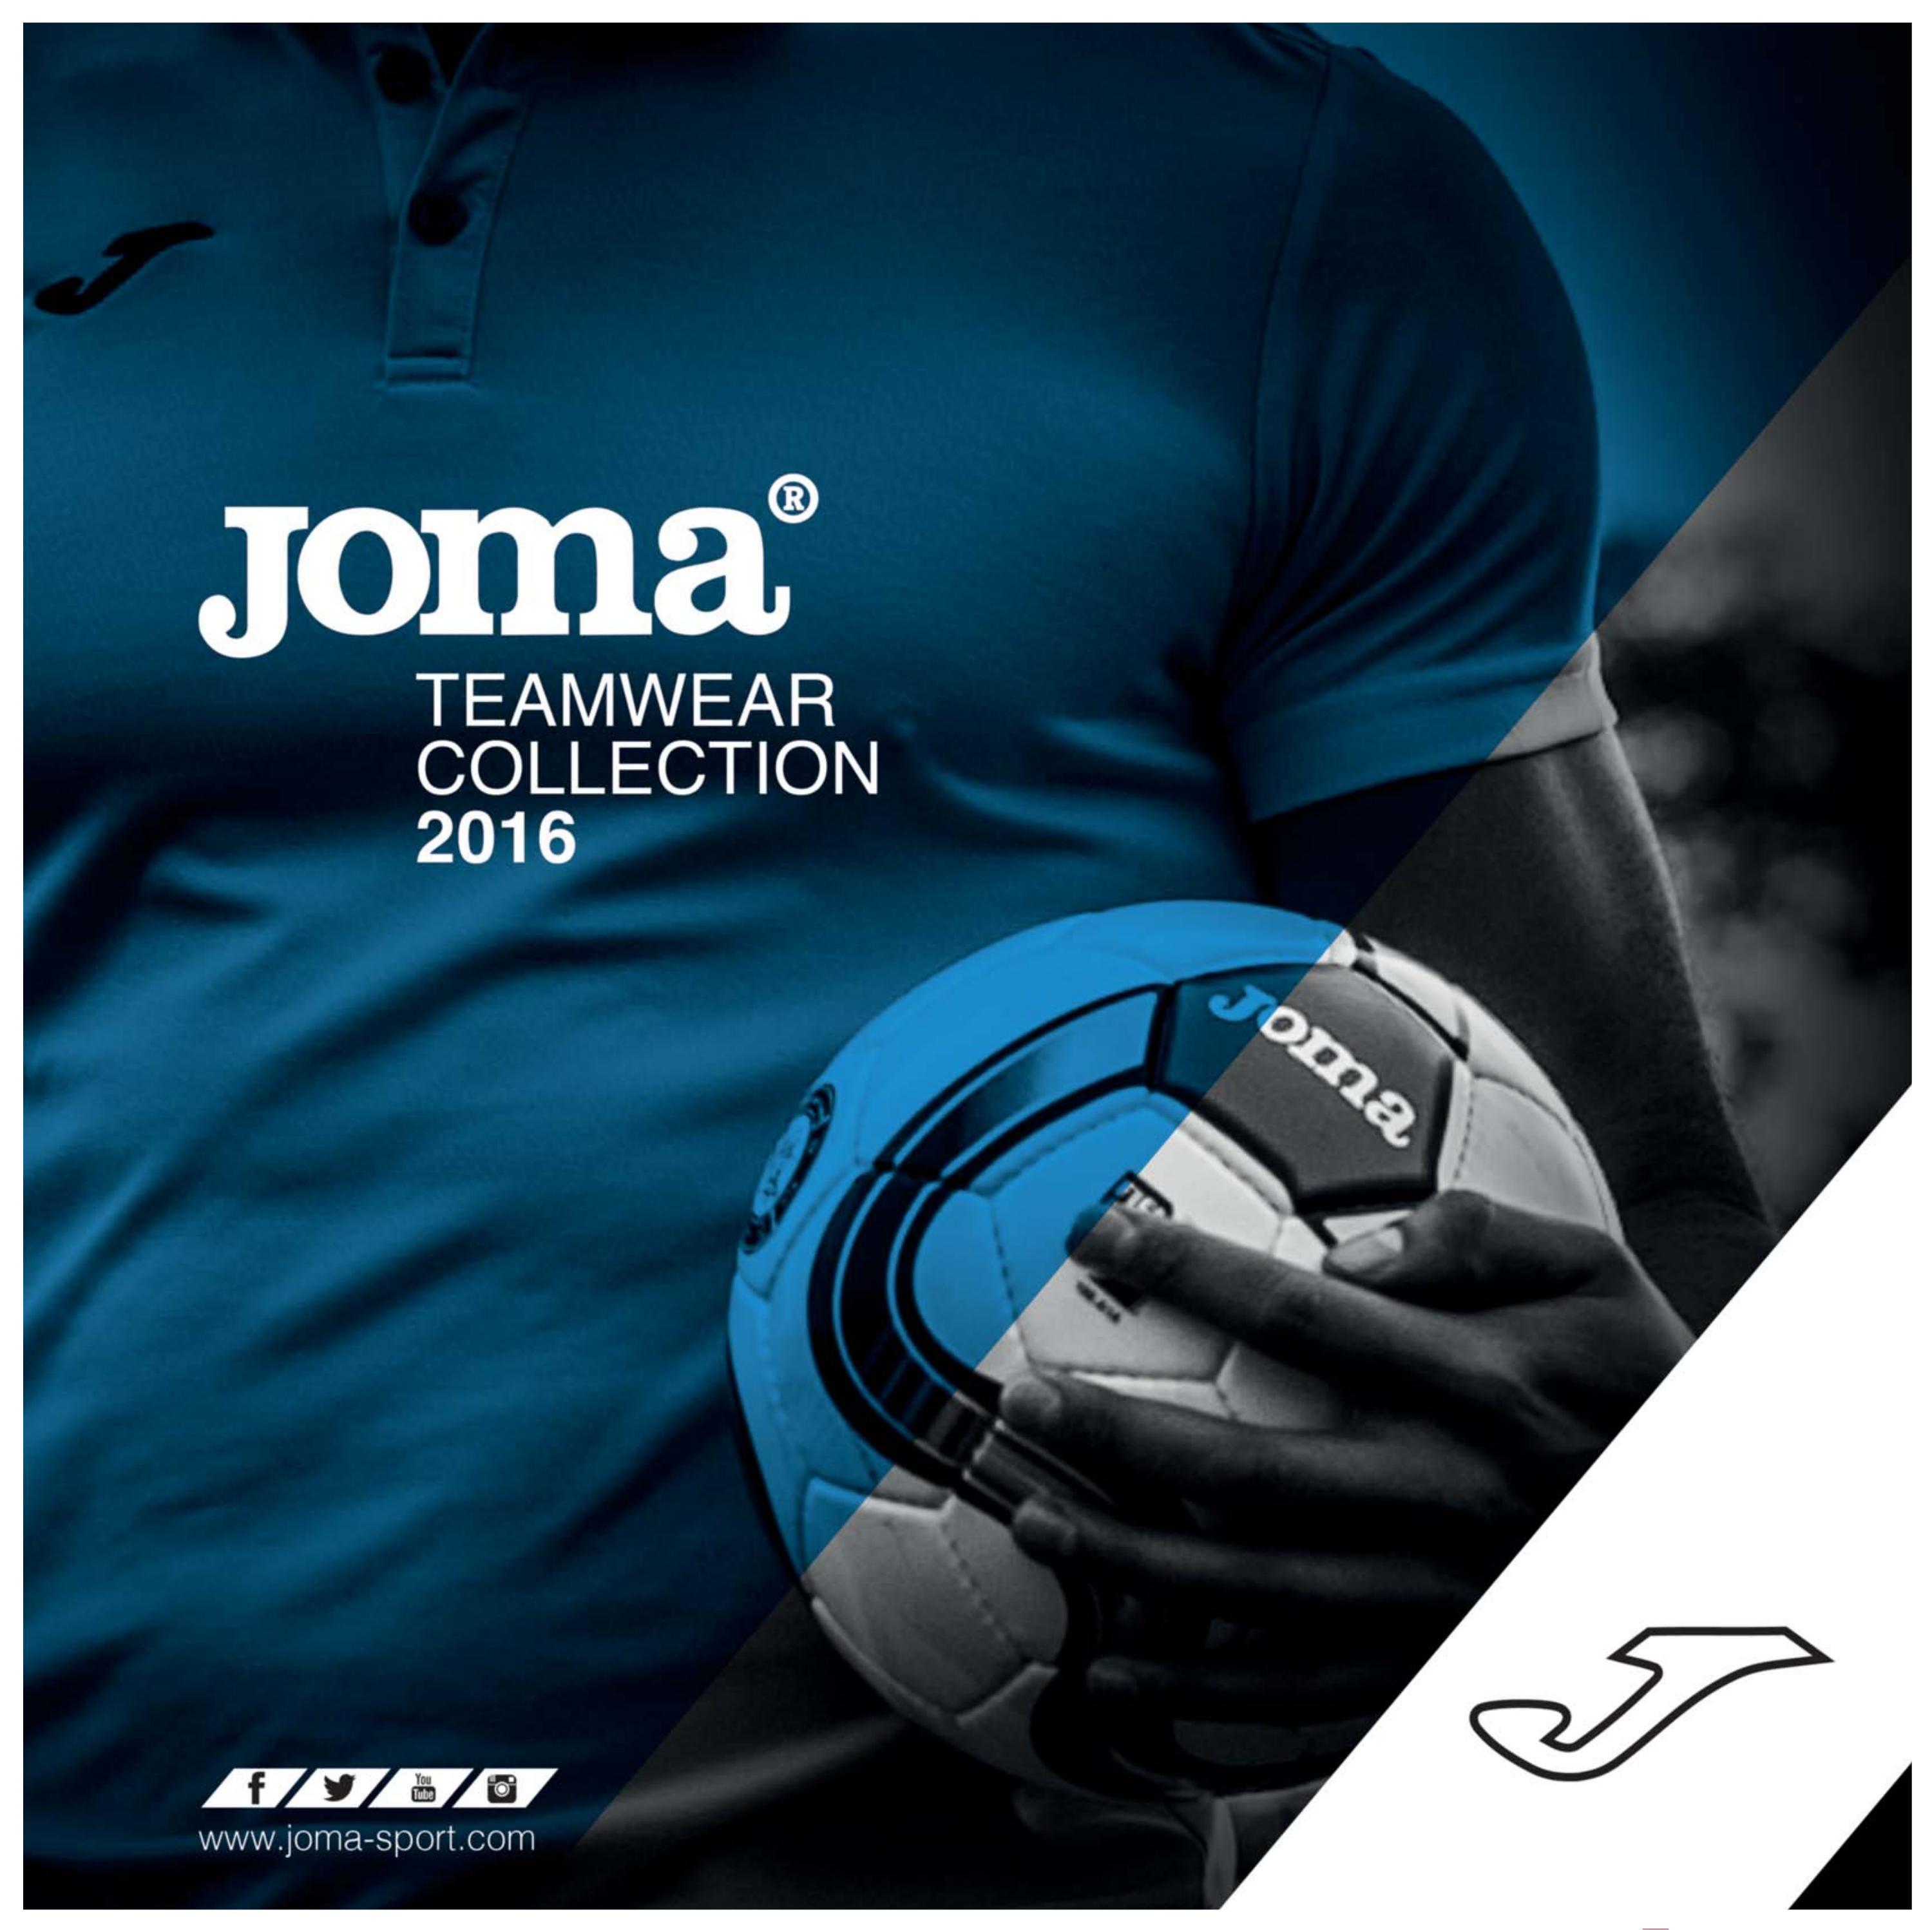 02814e4ca Teamwear 2016 (Germany) by JOMA SPORT - issuu